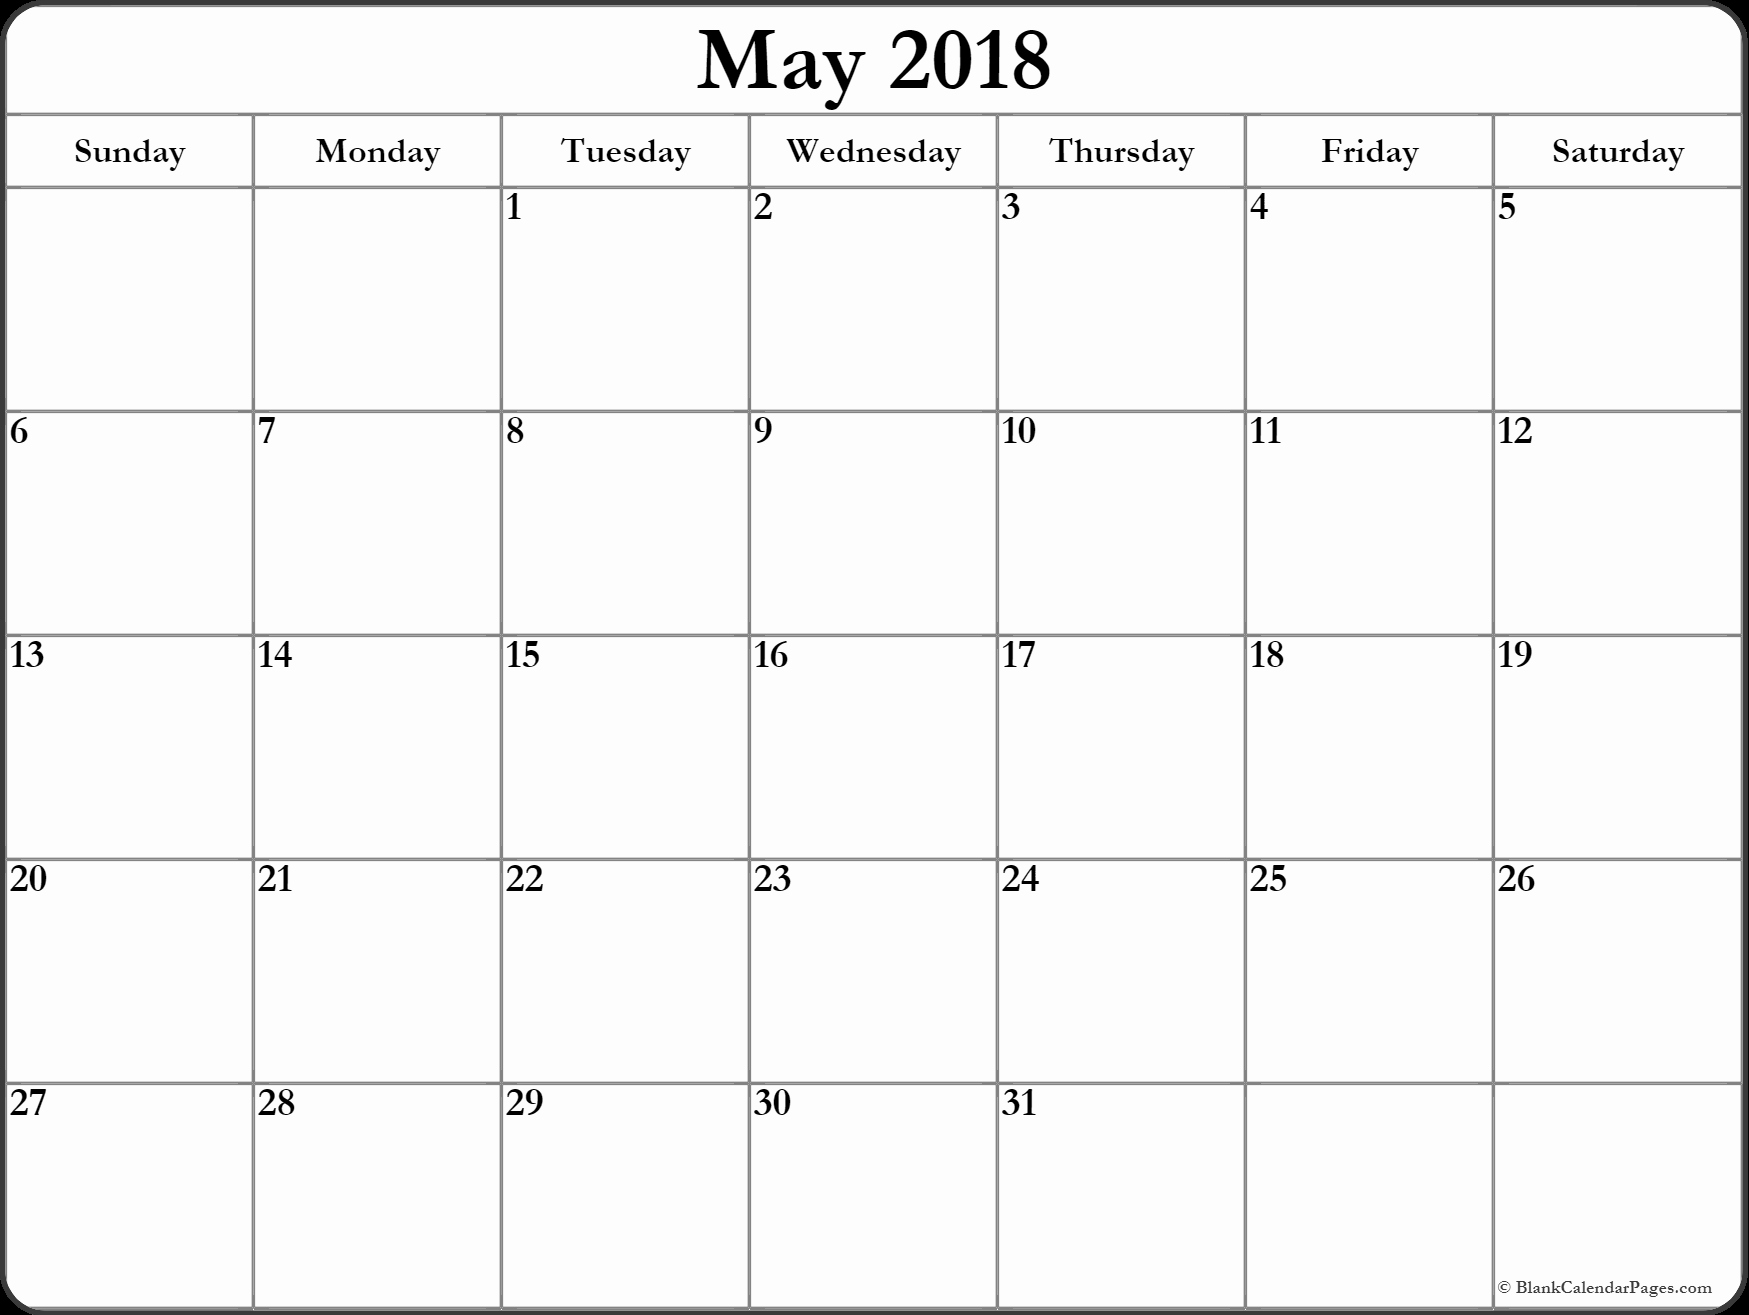 Blank May 2018 Calendar Printable Awesome May 2018 Printable Calendar 8 Free Blank Templates